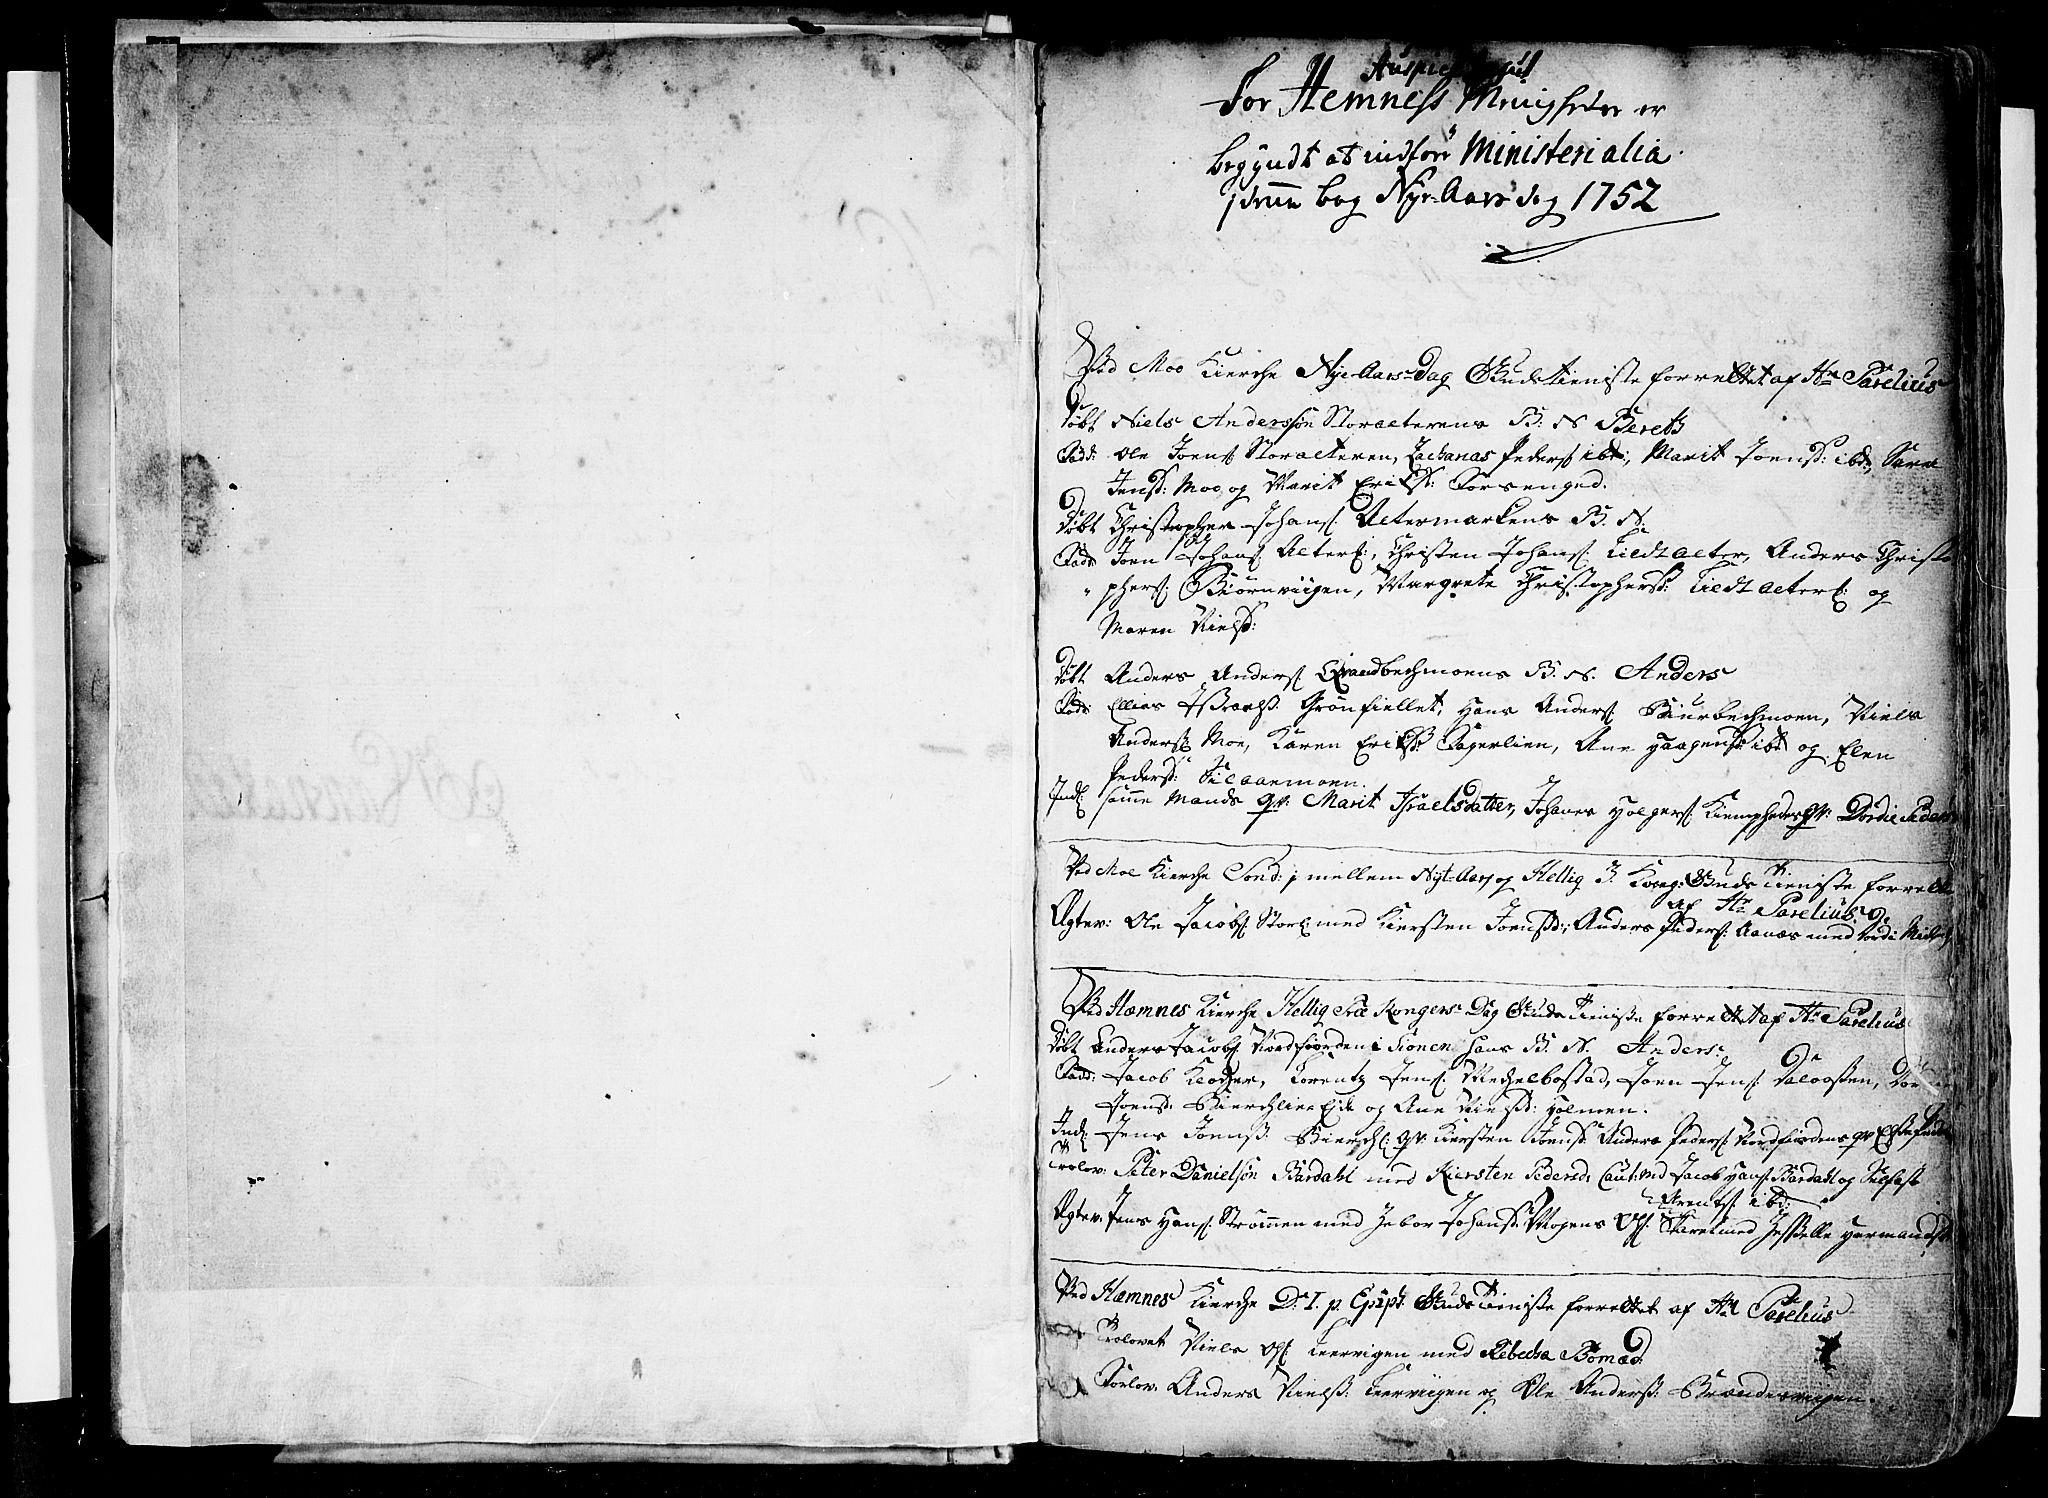 SAT, Ministerialprotokoller, klokkerbøker og fødselsregistre - Nordland, 825/L0348: Ministerialbok nr. 825A04, 1752-1788